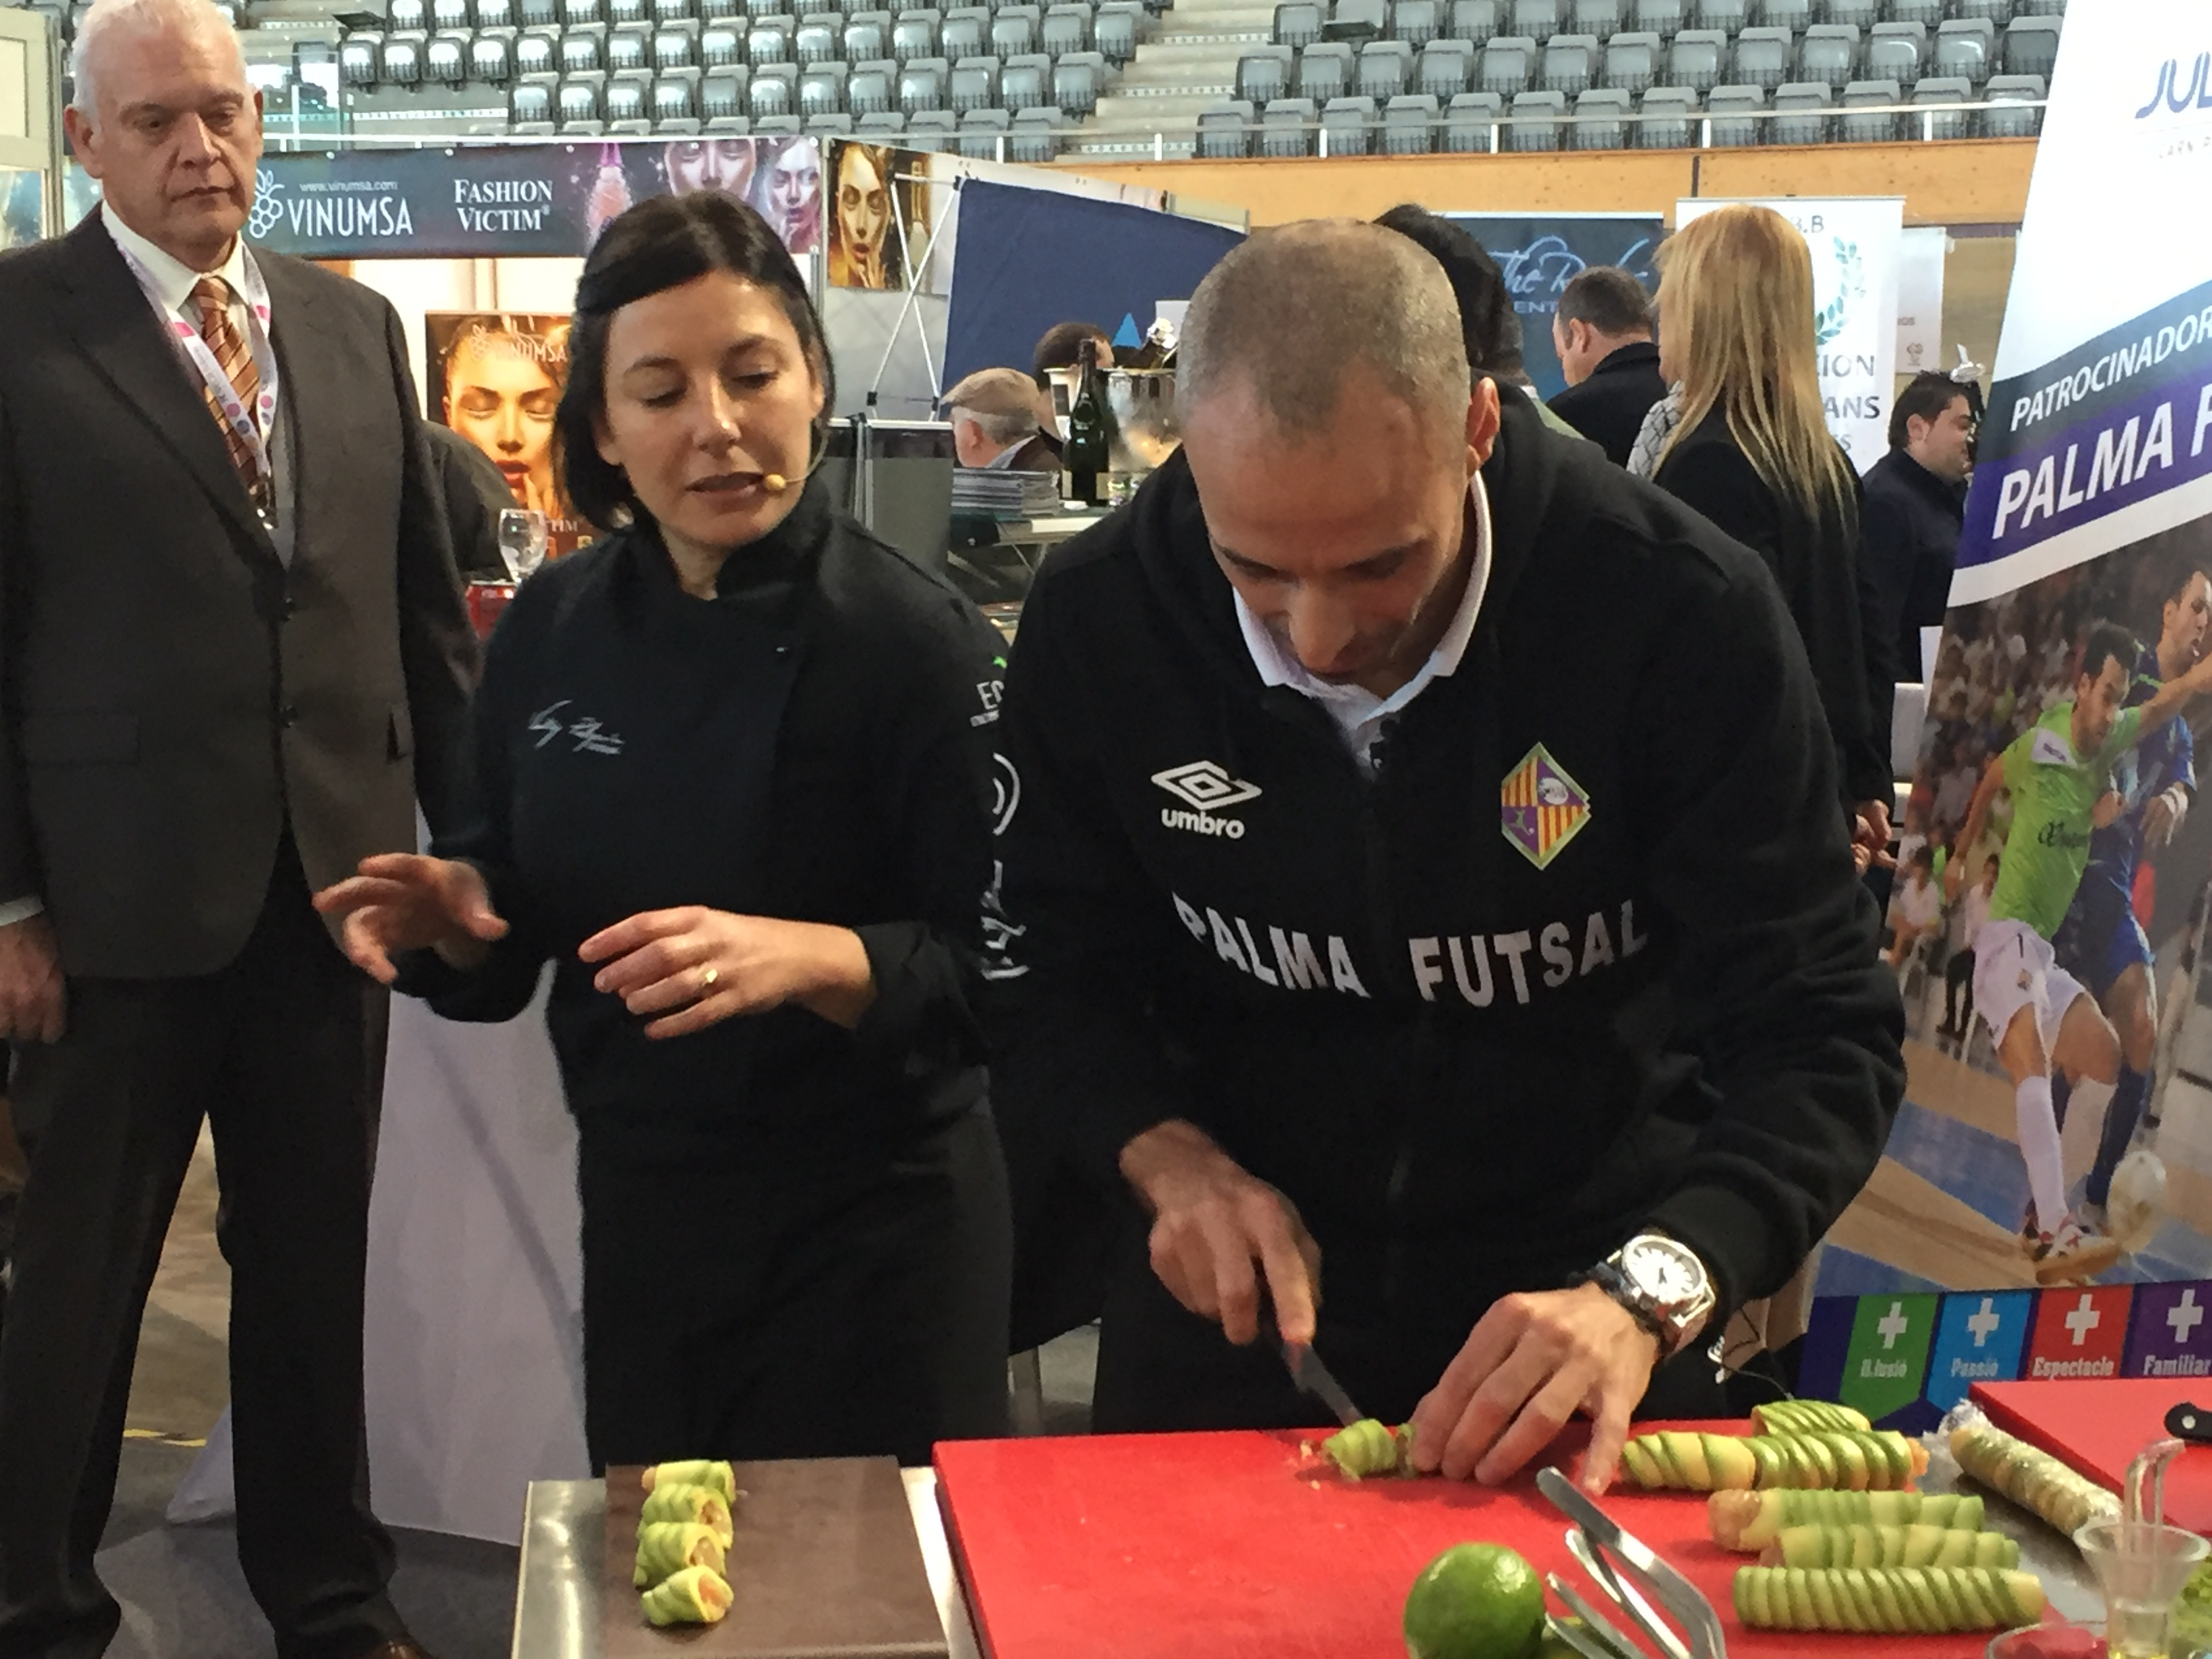 Vadillo y Vicky Pulgarín elaboran la tapa del Palma Futsal (3)